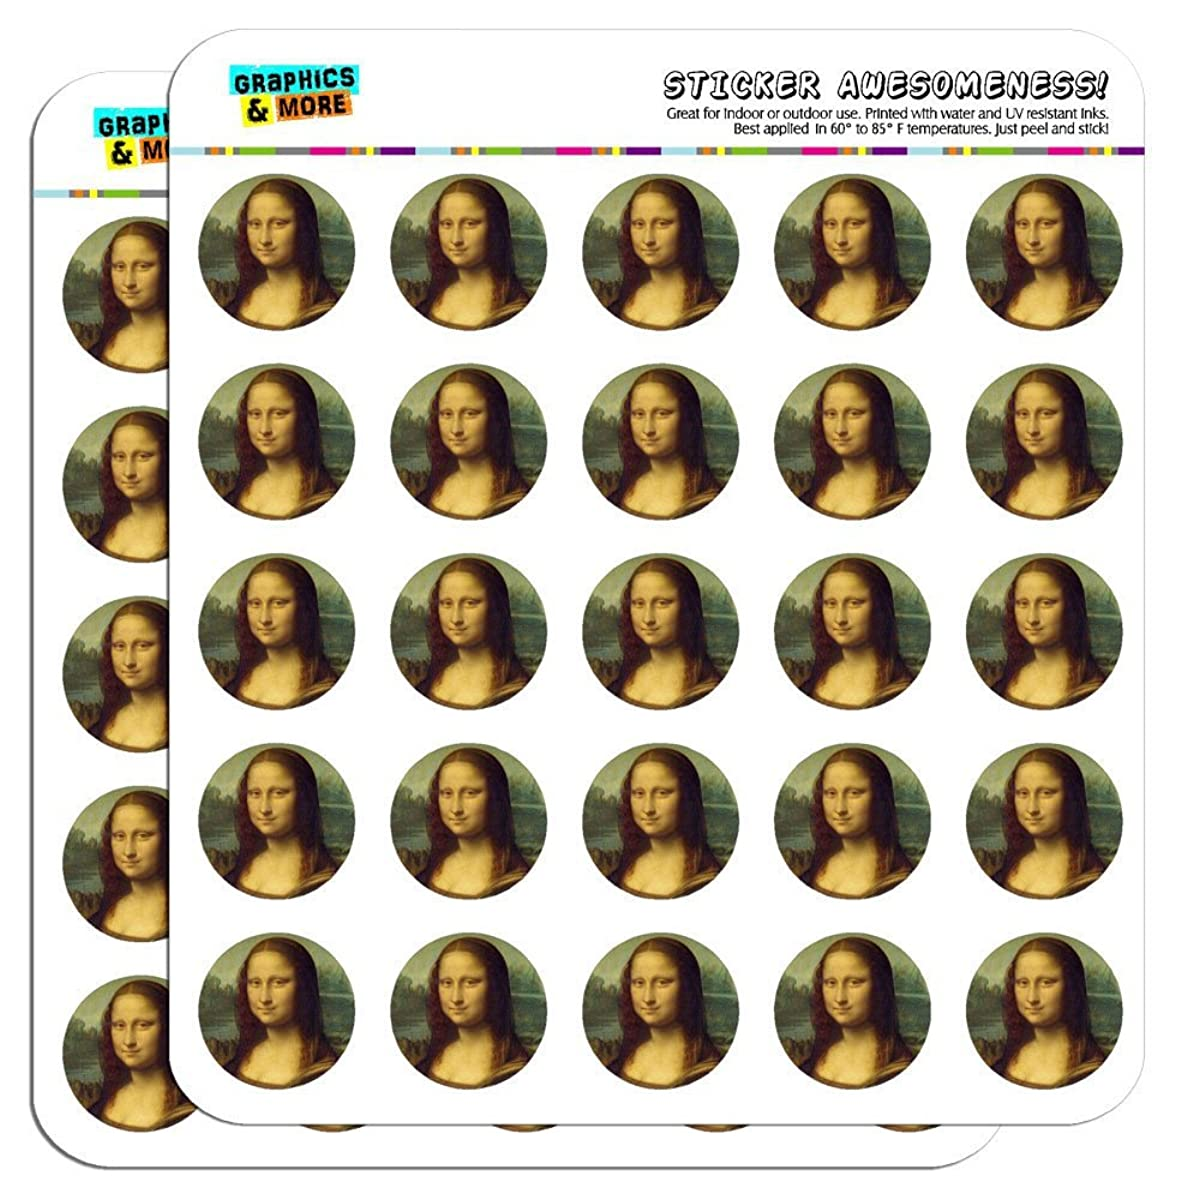 Mona Lisa Painting by Leonardo da Vinci 1